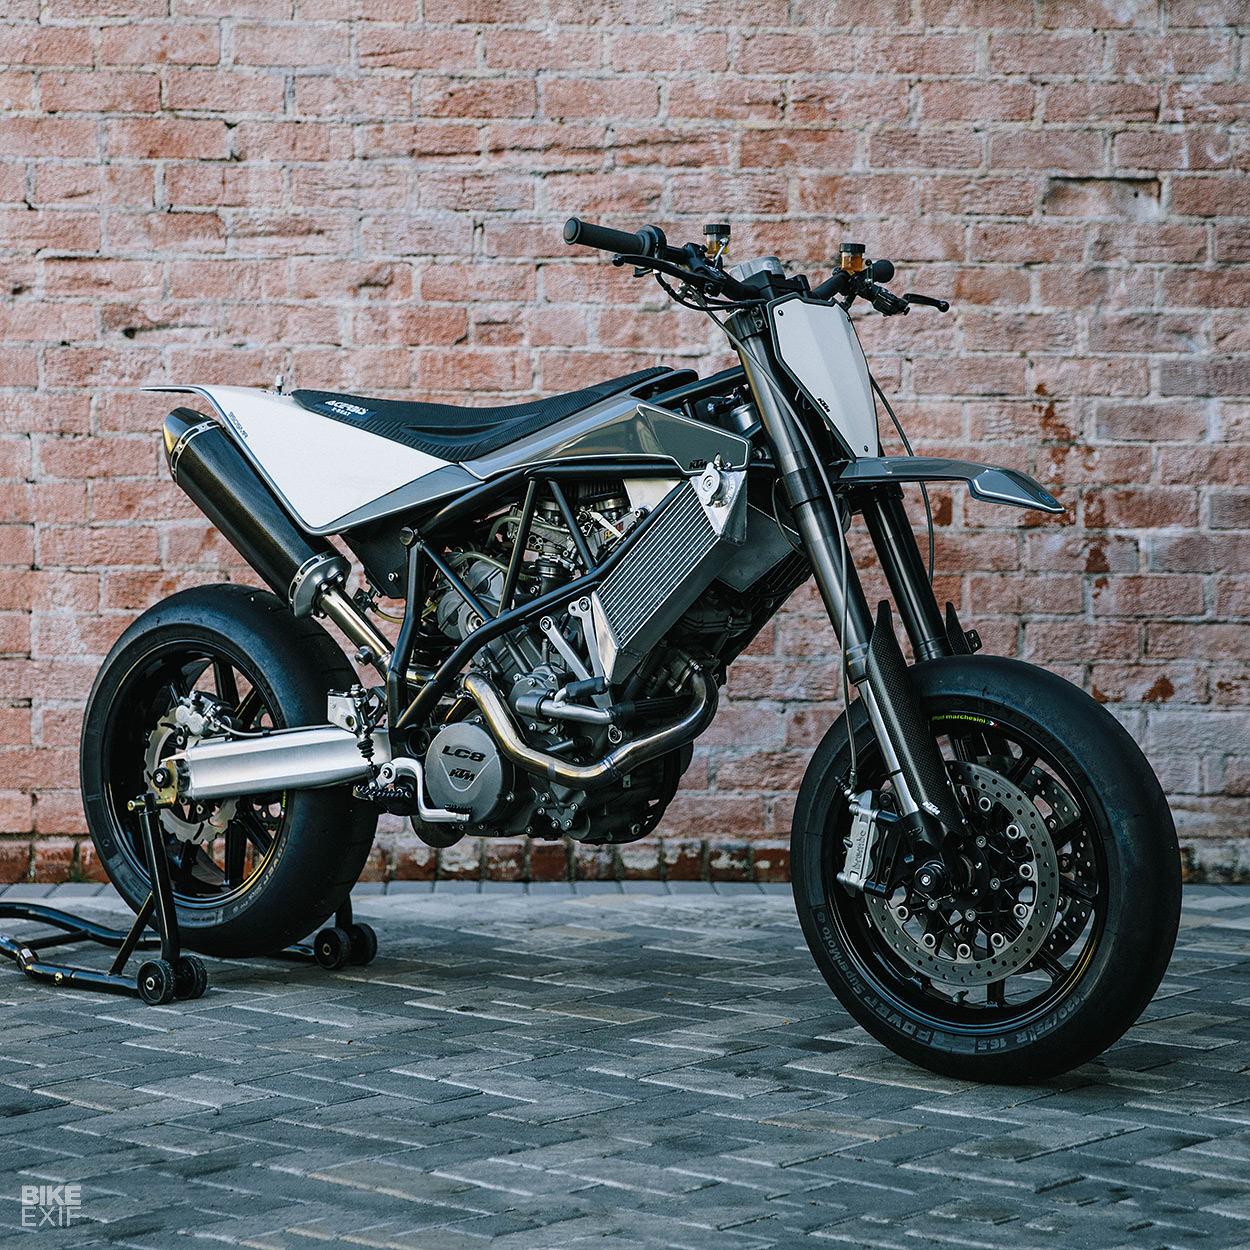 http://kickstart.bikeexif.com/wp-content/uploads/2018/05/ktm-950-sm-supermoto-hazan-motorworks-1.jpg